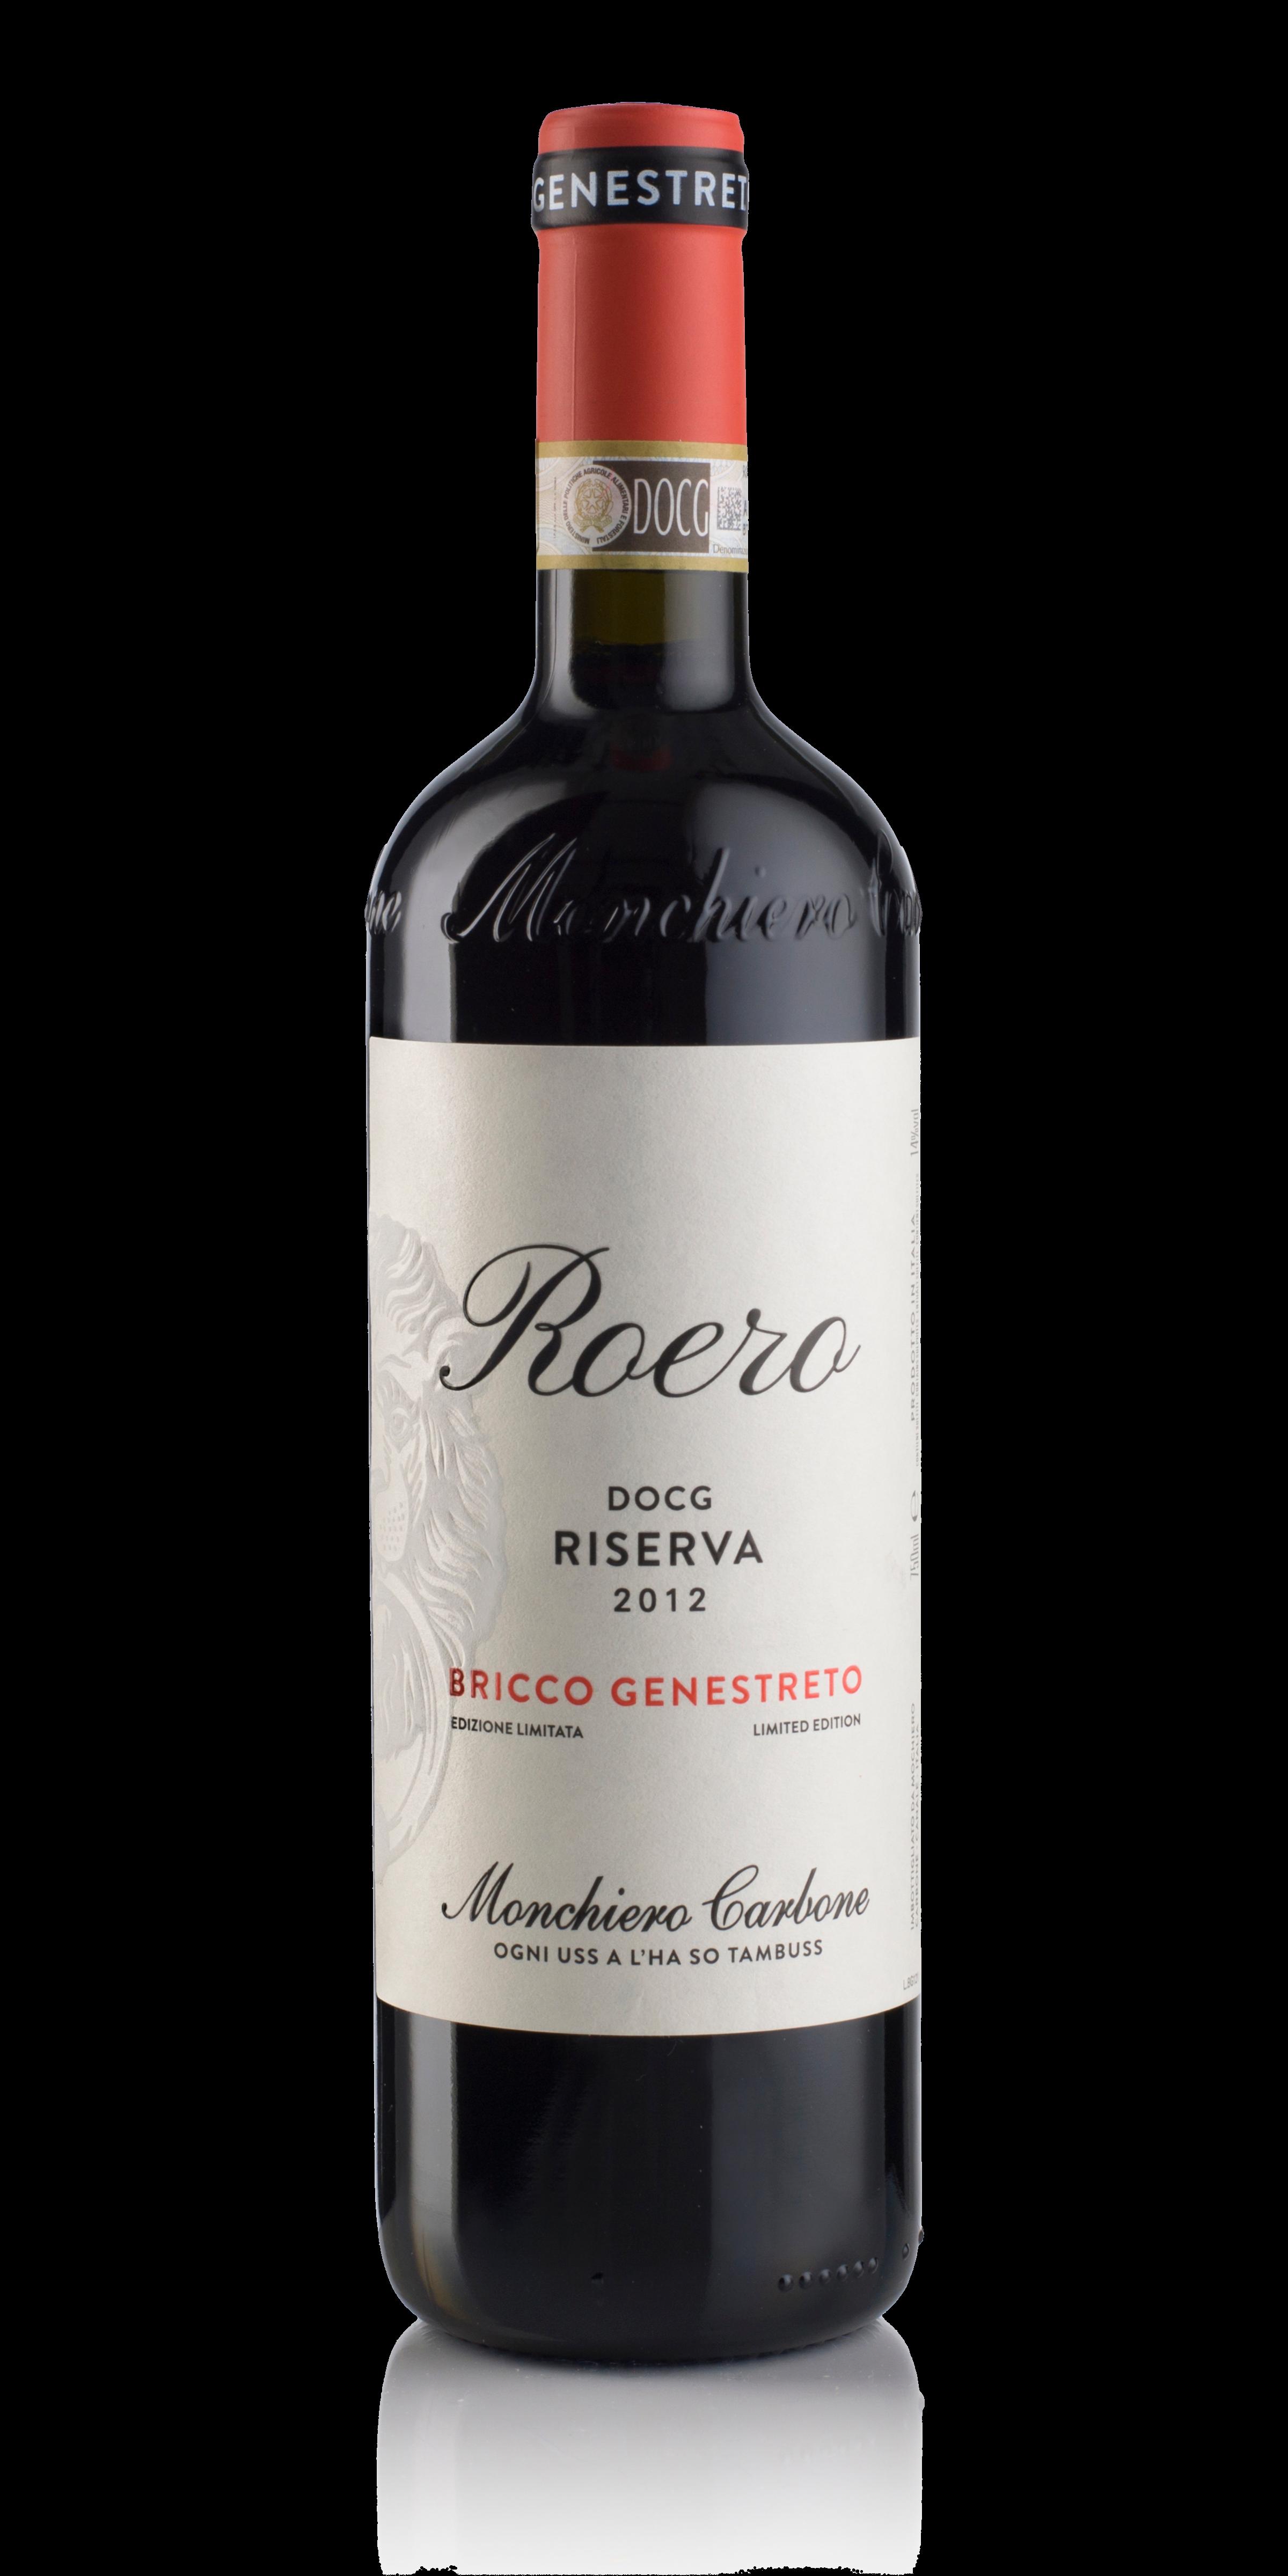 Bottiglia Bricco Genestreto Roero Riserva